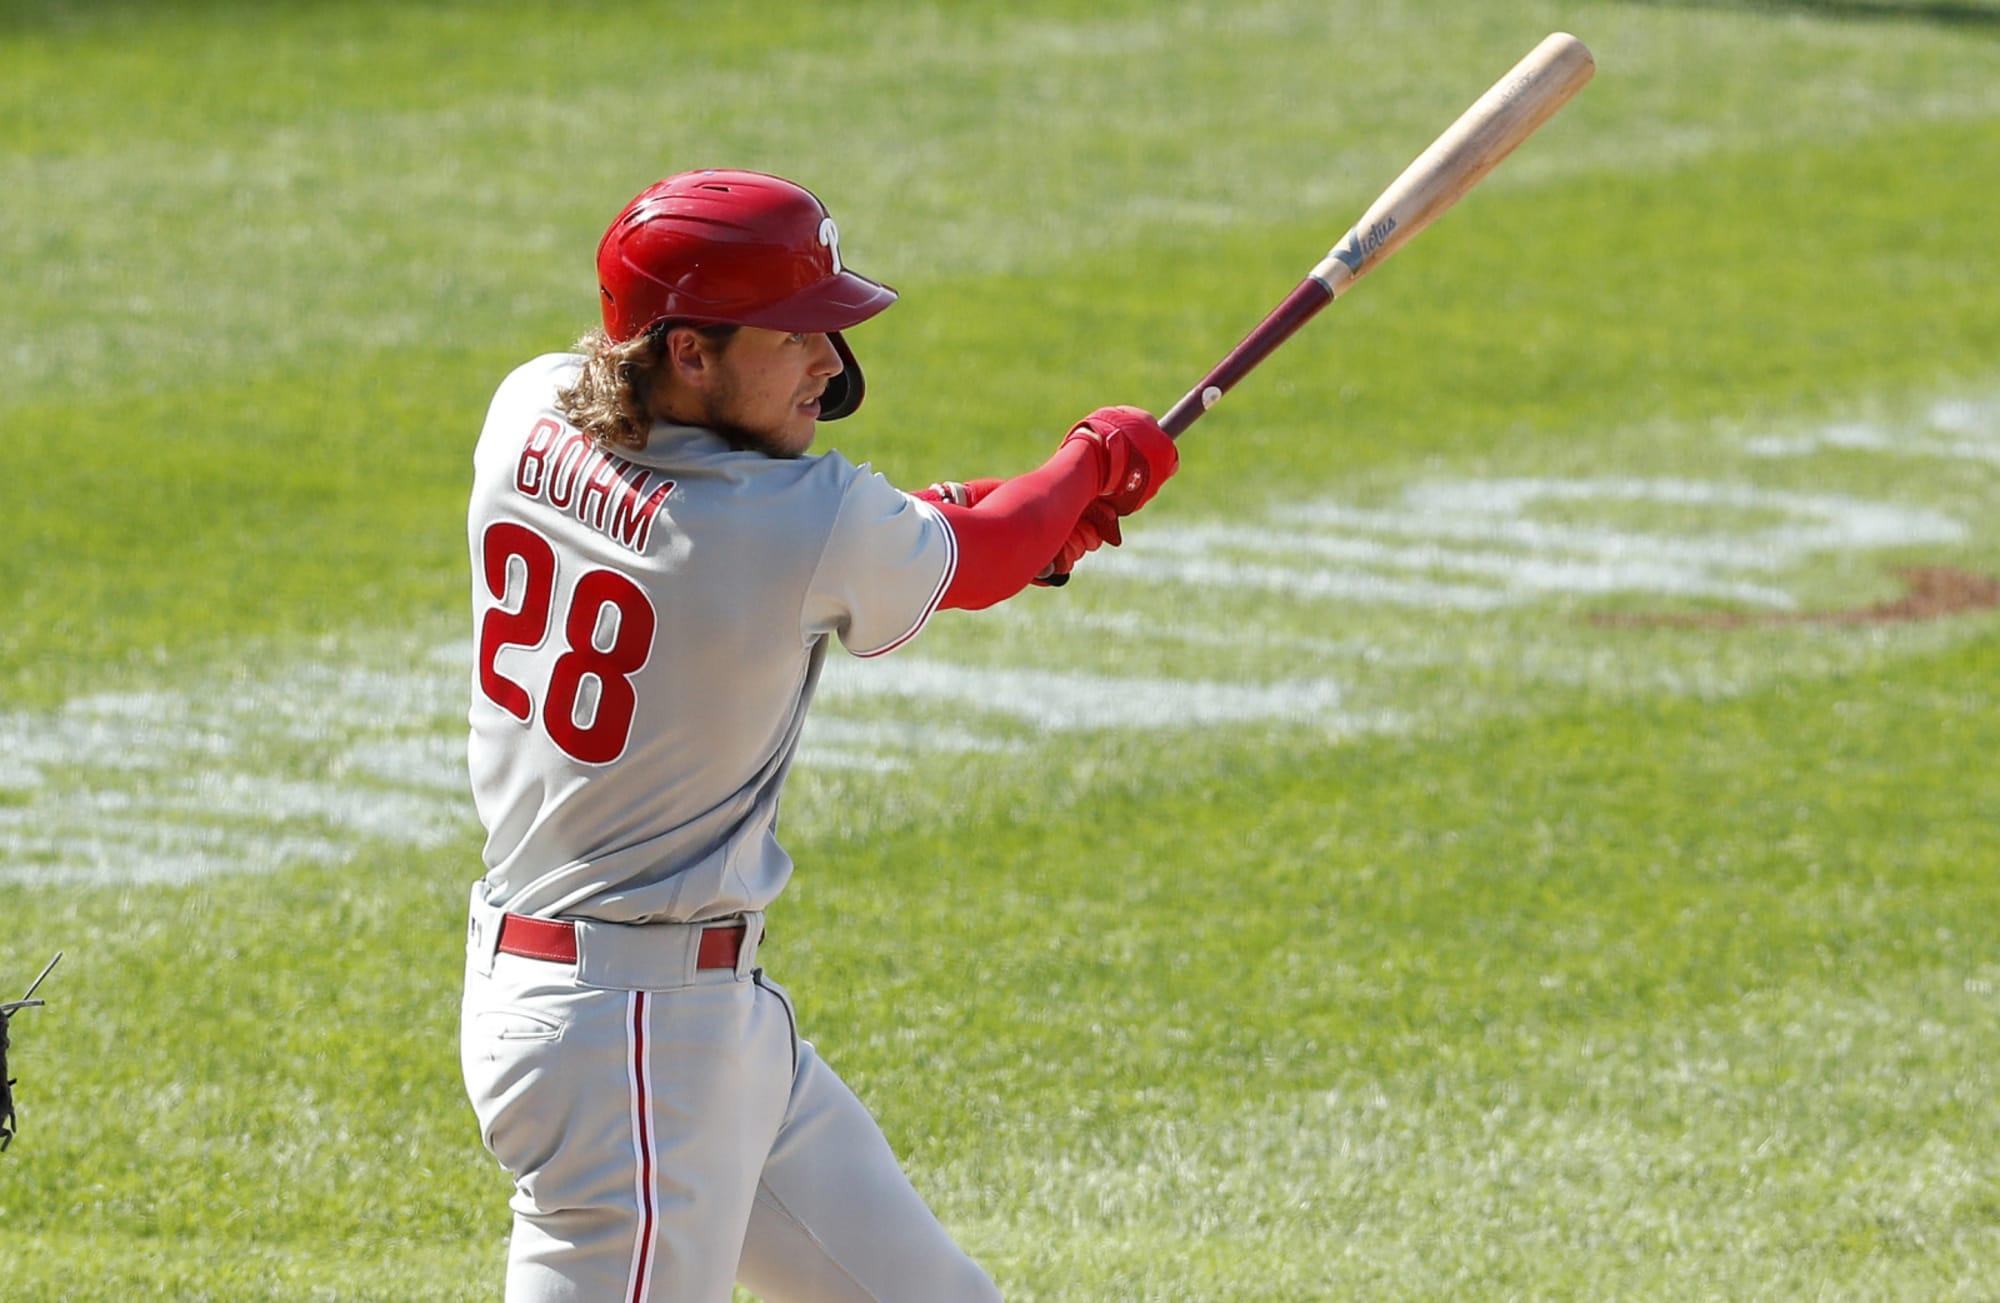 Phillies: Alec Bohm recalls 'humbling' rookie season